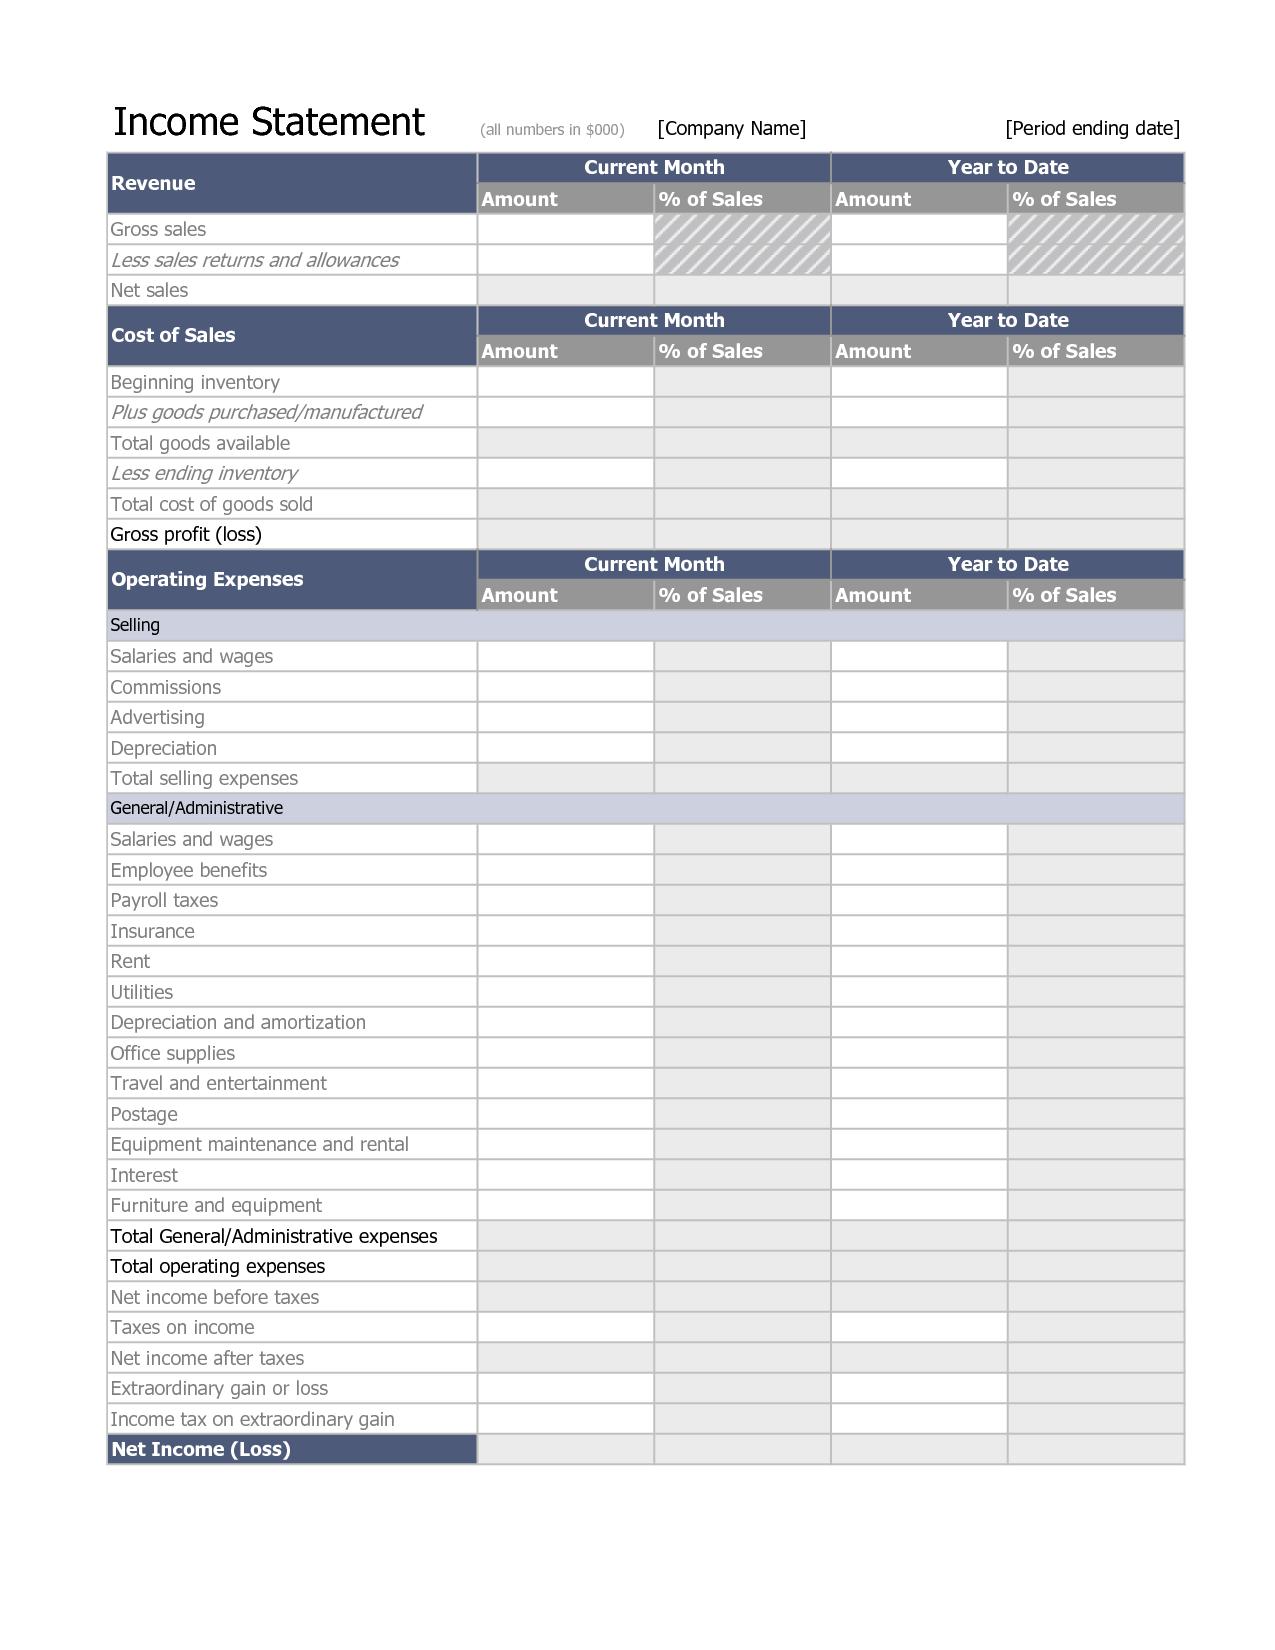 Free Personal Balance Sheet Template and Financial Statement Analysis Spreadsheet Laobingkaisuo